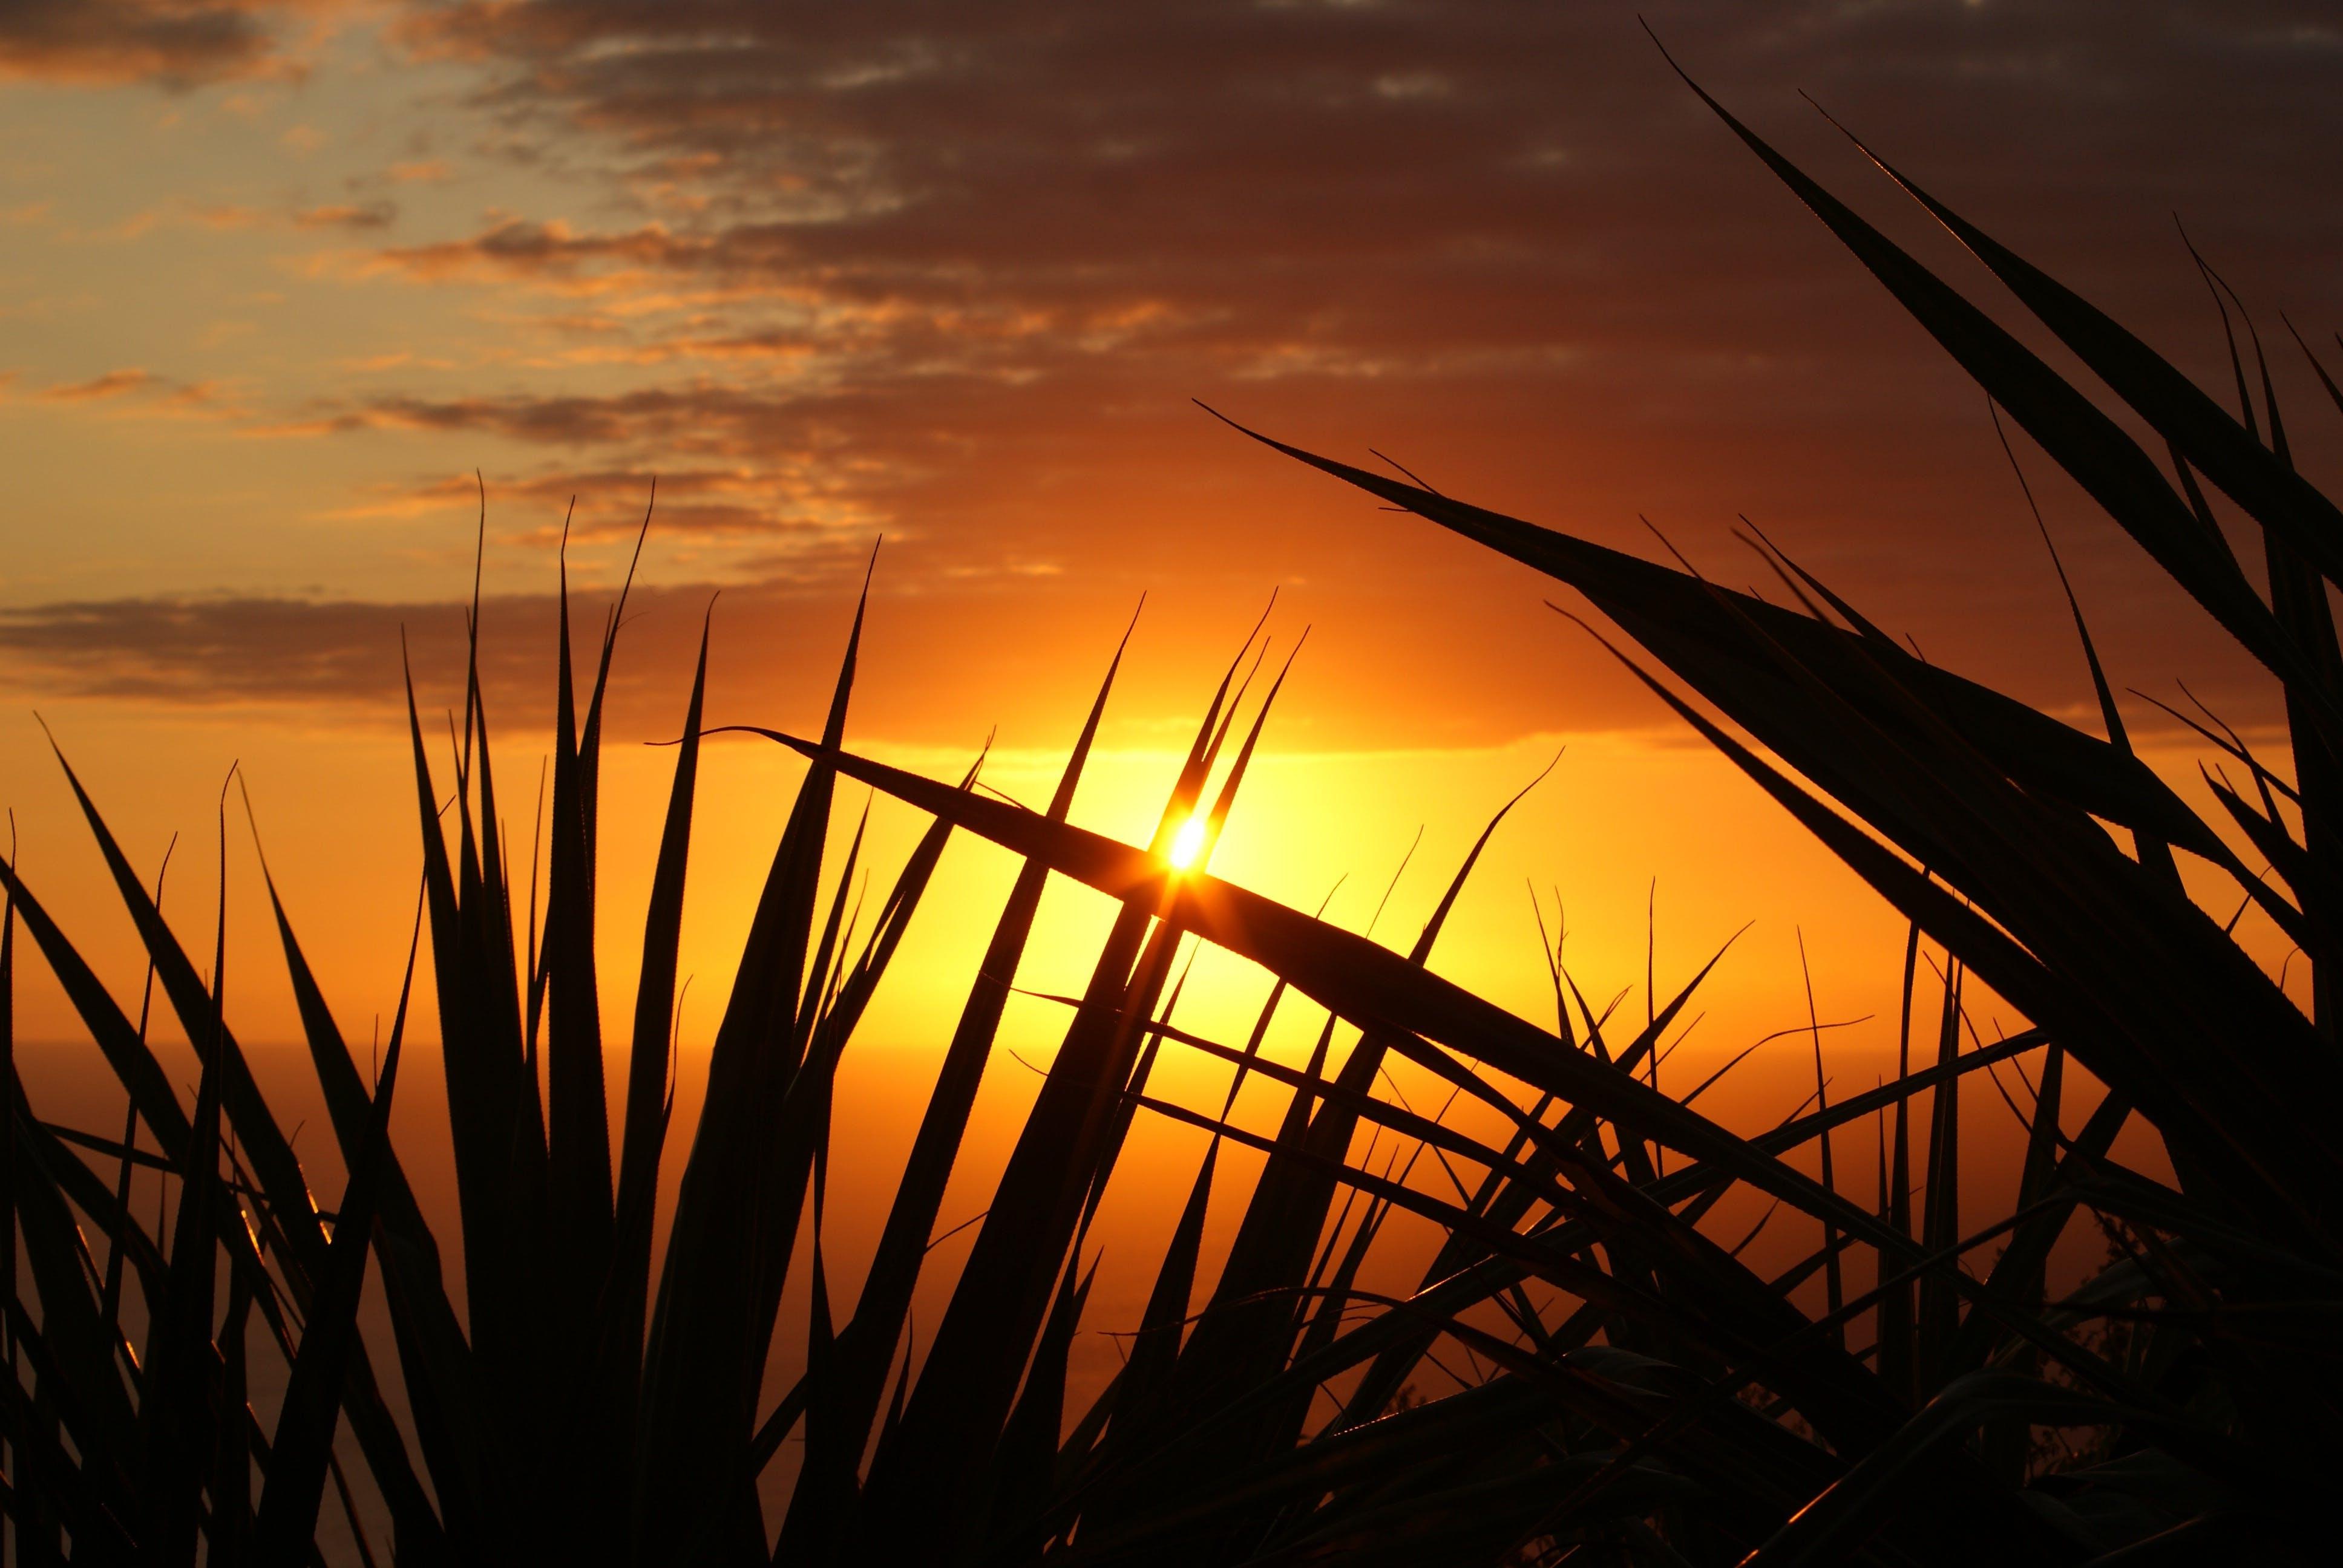 Silhouette of Grass Under the Sepia Sky